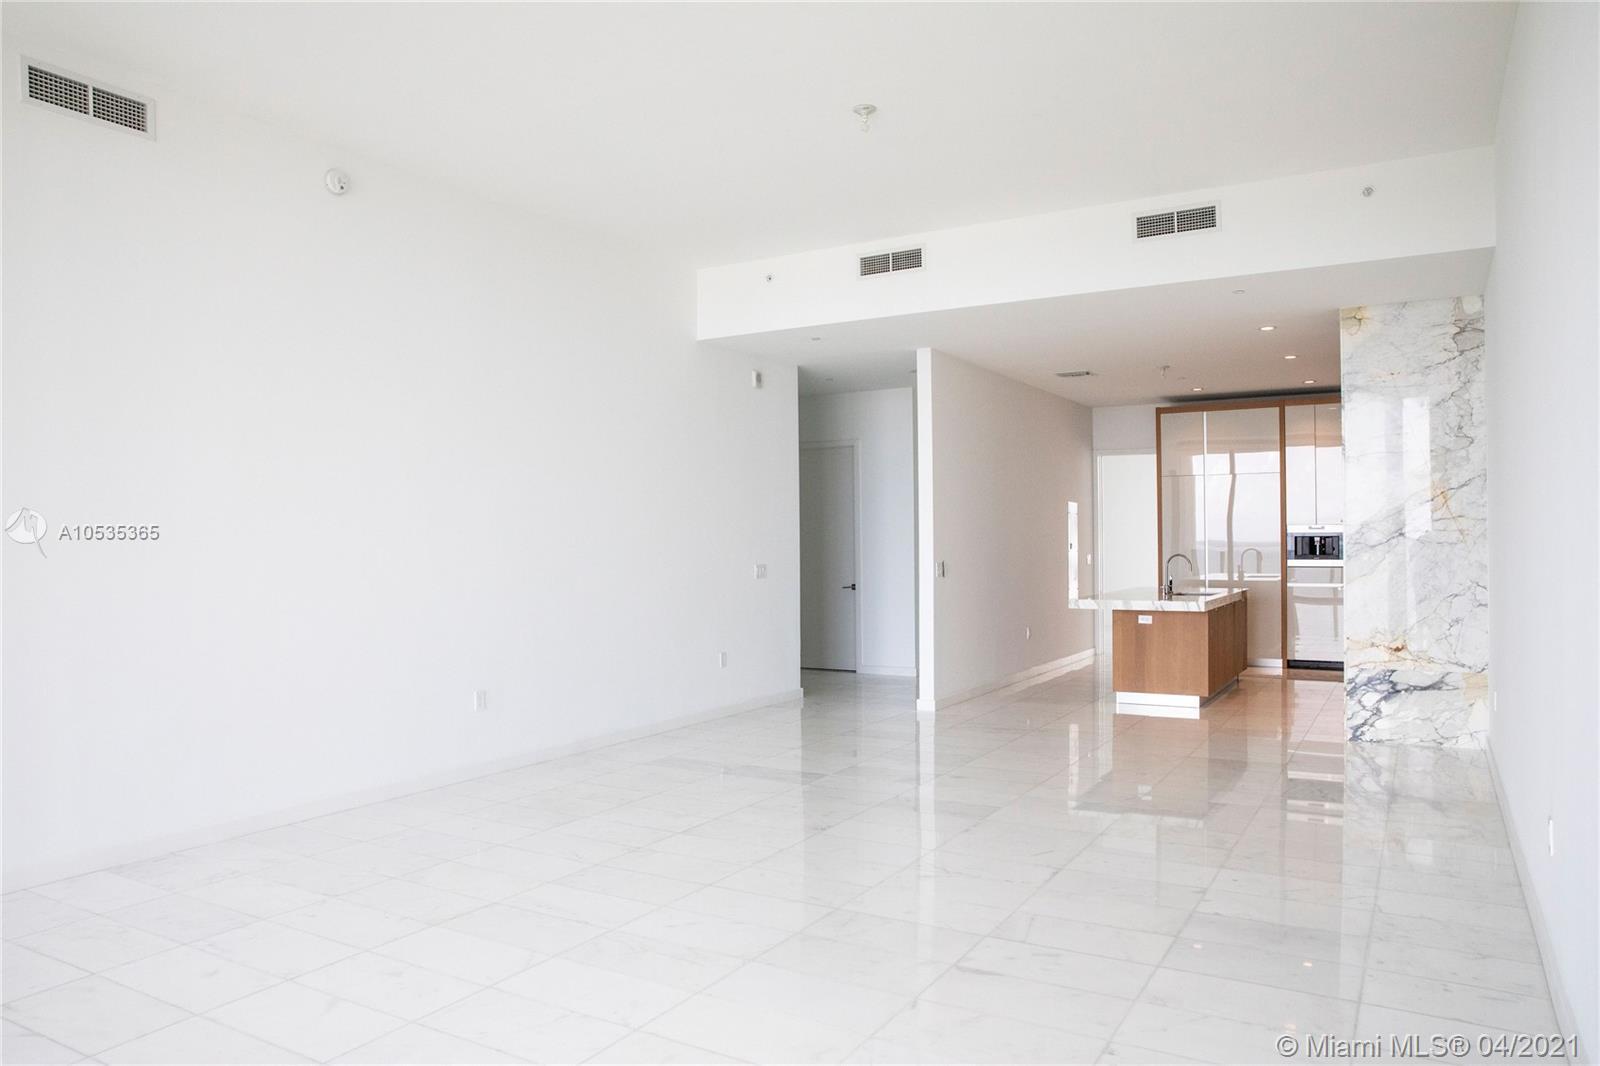 2821 S Bayshore Dr # 16B, Coconut Grove, Florida 33133, 3 Bedrooms Bedrooms, ,4 BathroomsBathrooms,Residential,For Sale,2821 S Bayshore Dr # 16B,A10535365